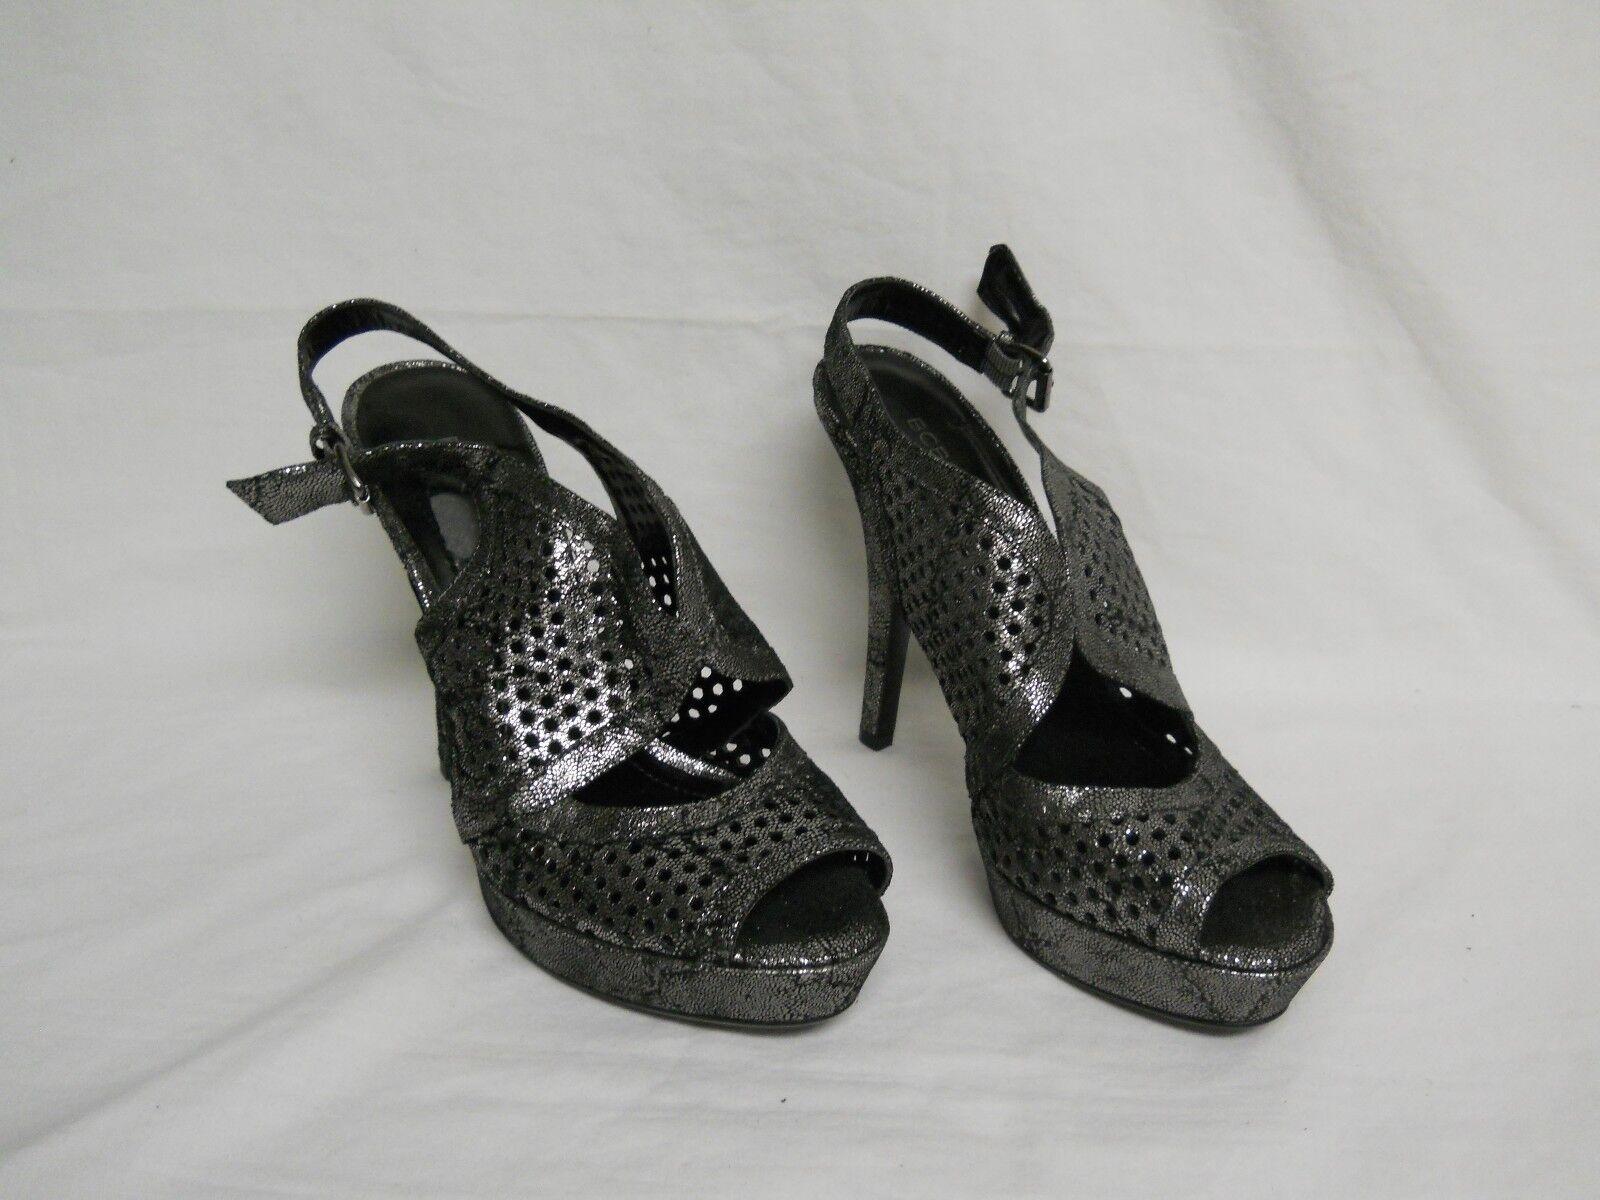 BCBGeneration BCBG New Womens Alana Leather Pewter Pebble Sandals 8.5 M shoes